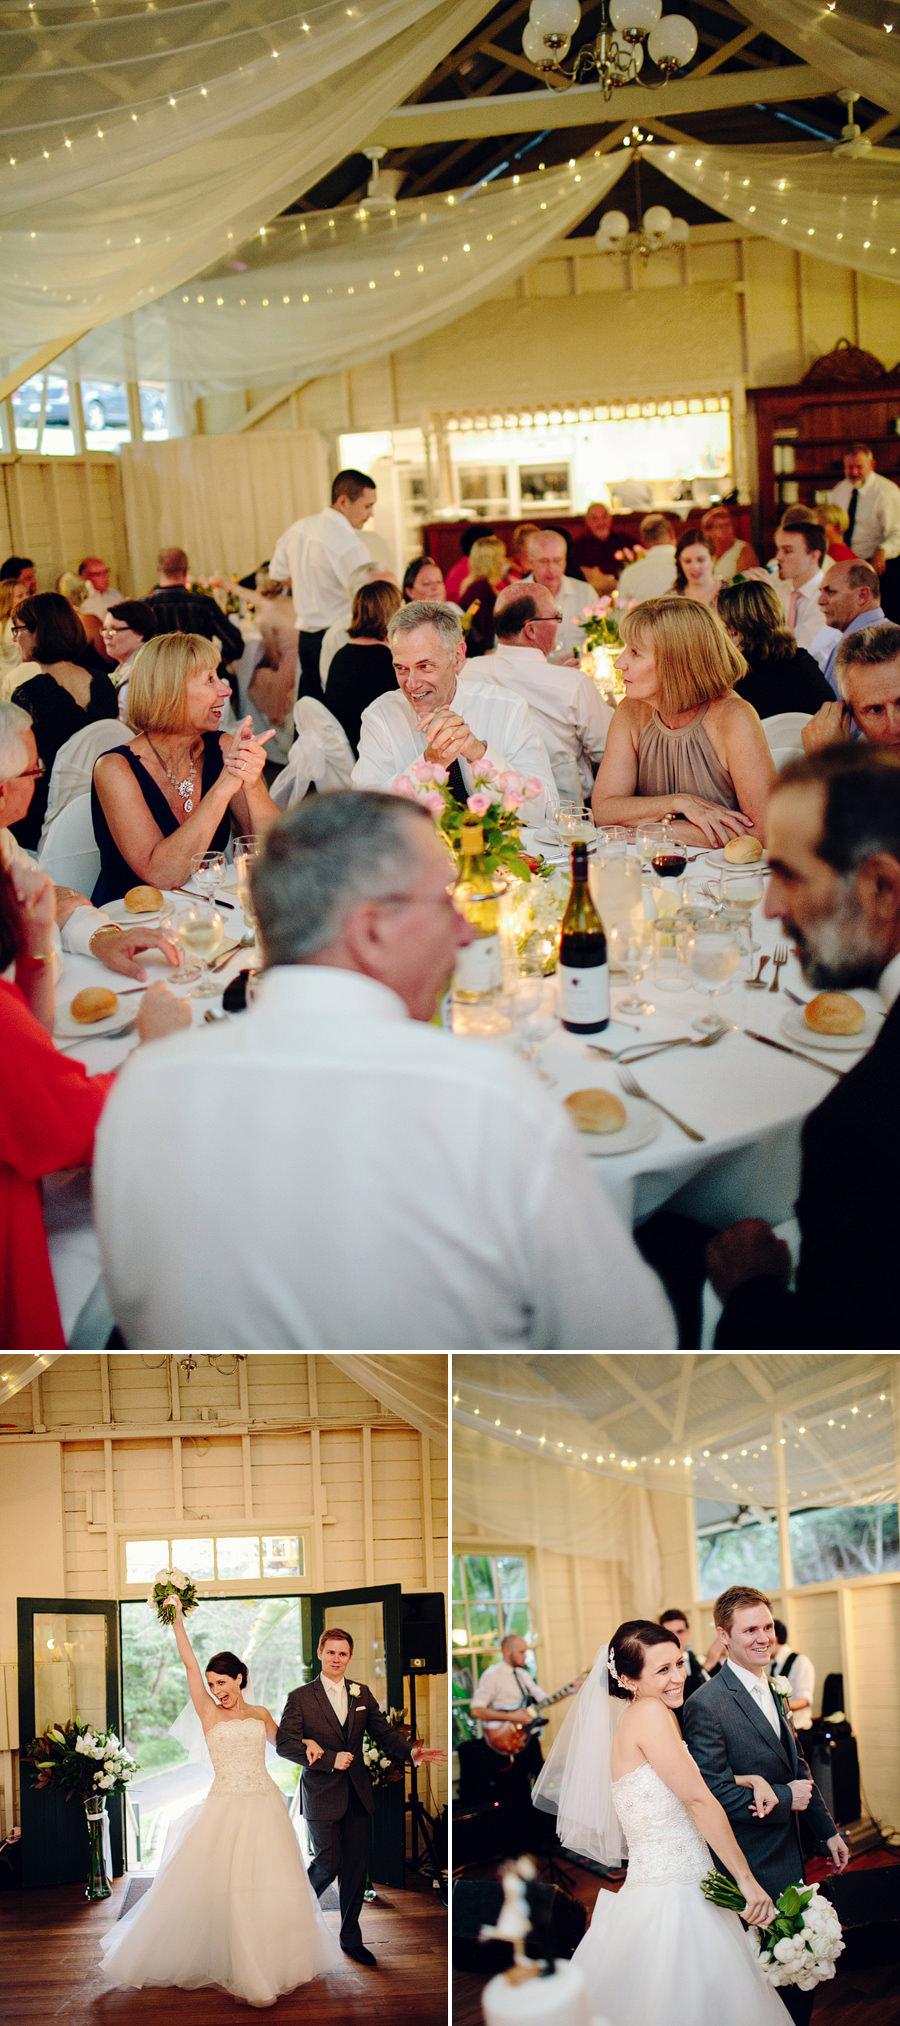 Modern Wedding Photographers: Bride & Groom entering reception